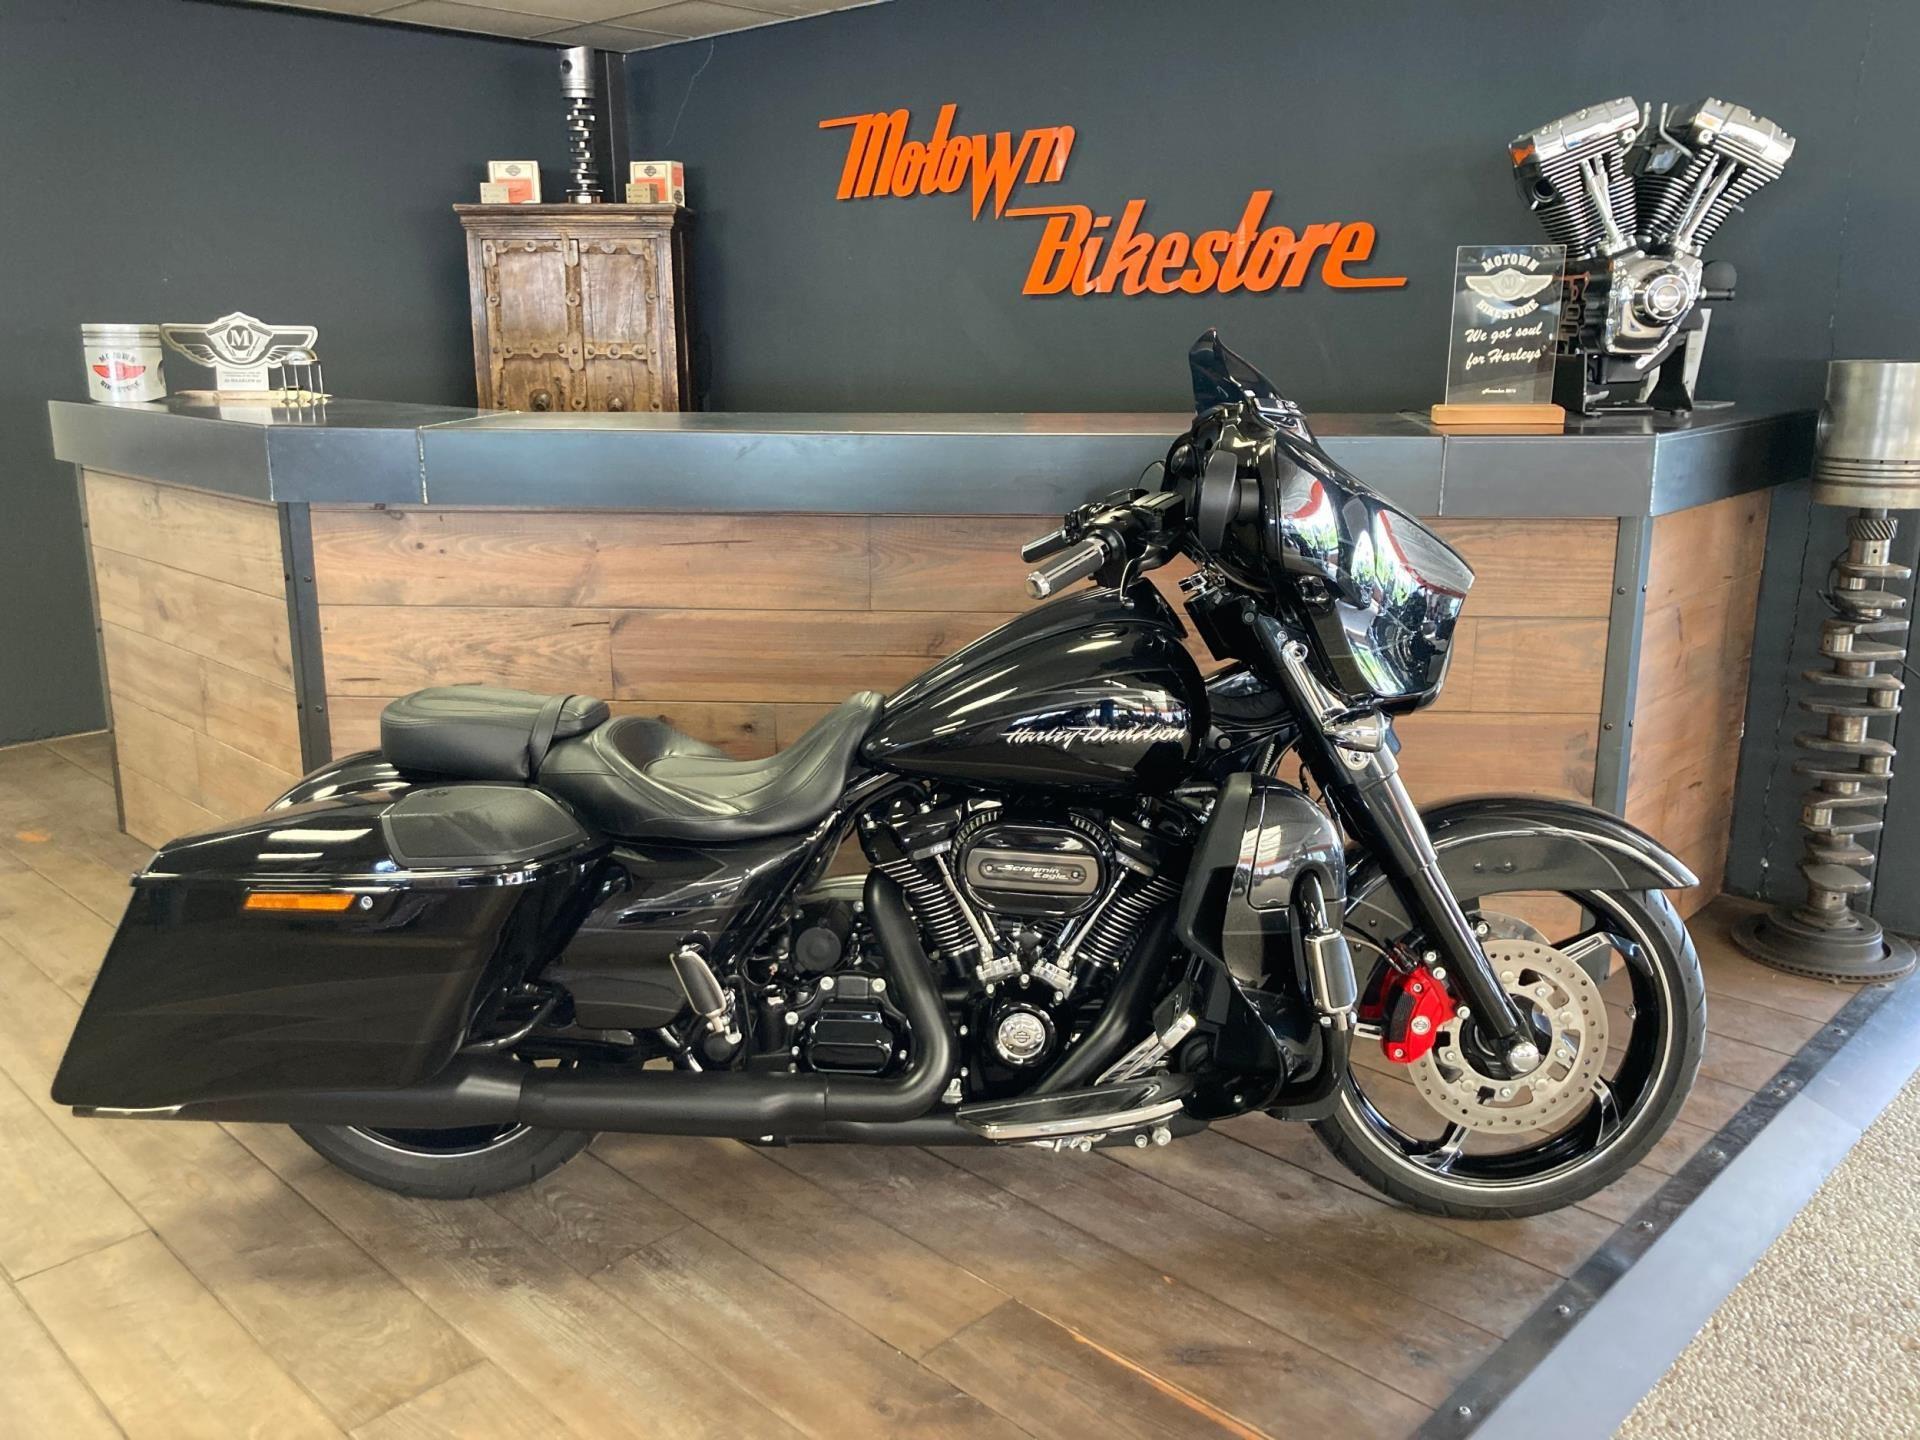 Harley Davidson FLHXSE CVO Streetglide 114Ci occasion - Motown Bikestore